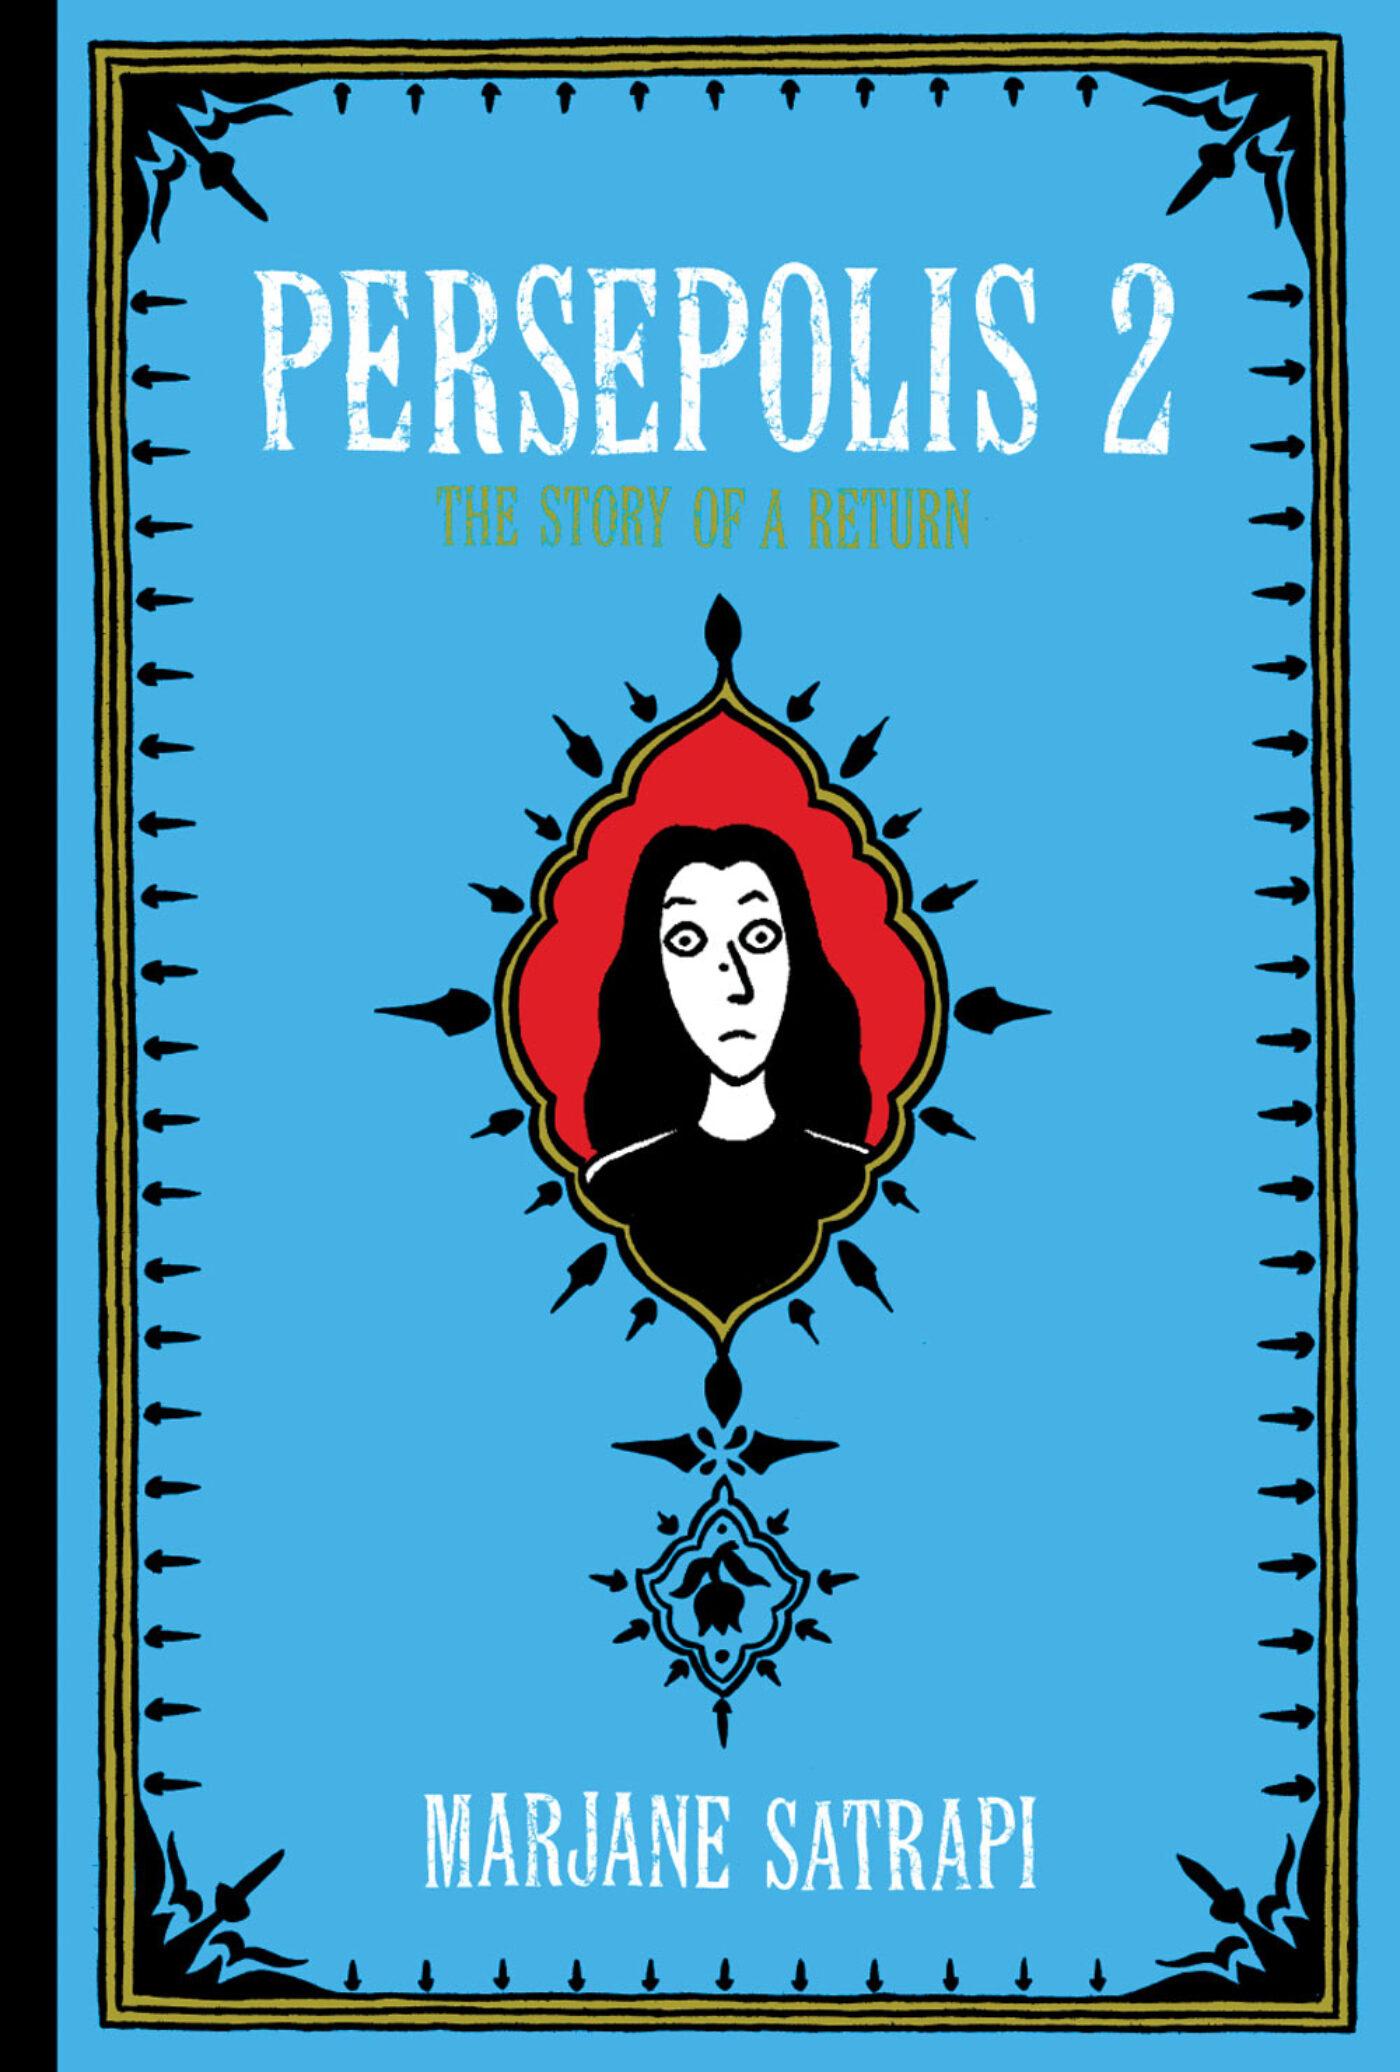 Marjane Satrapi S Peresepolis 2 The Story Of Return Bomb Magazine